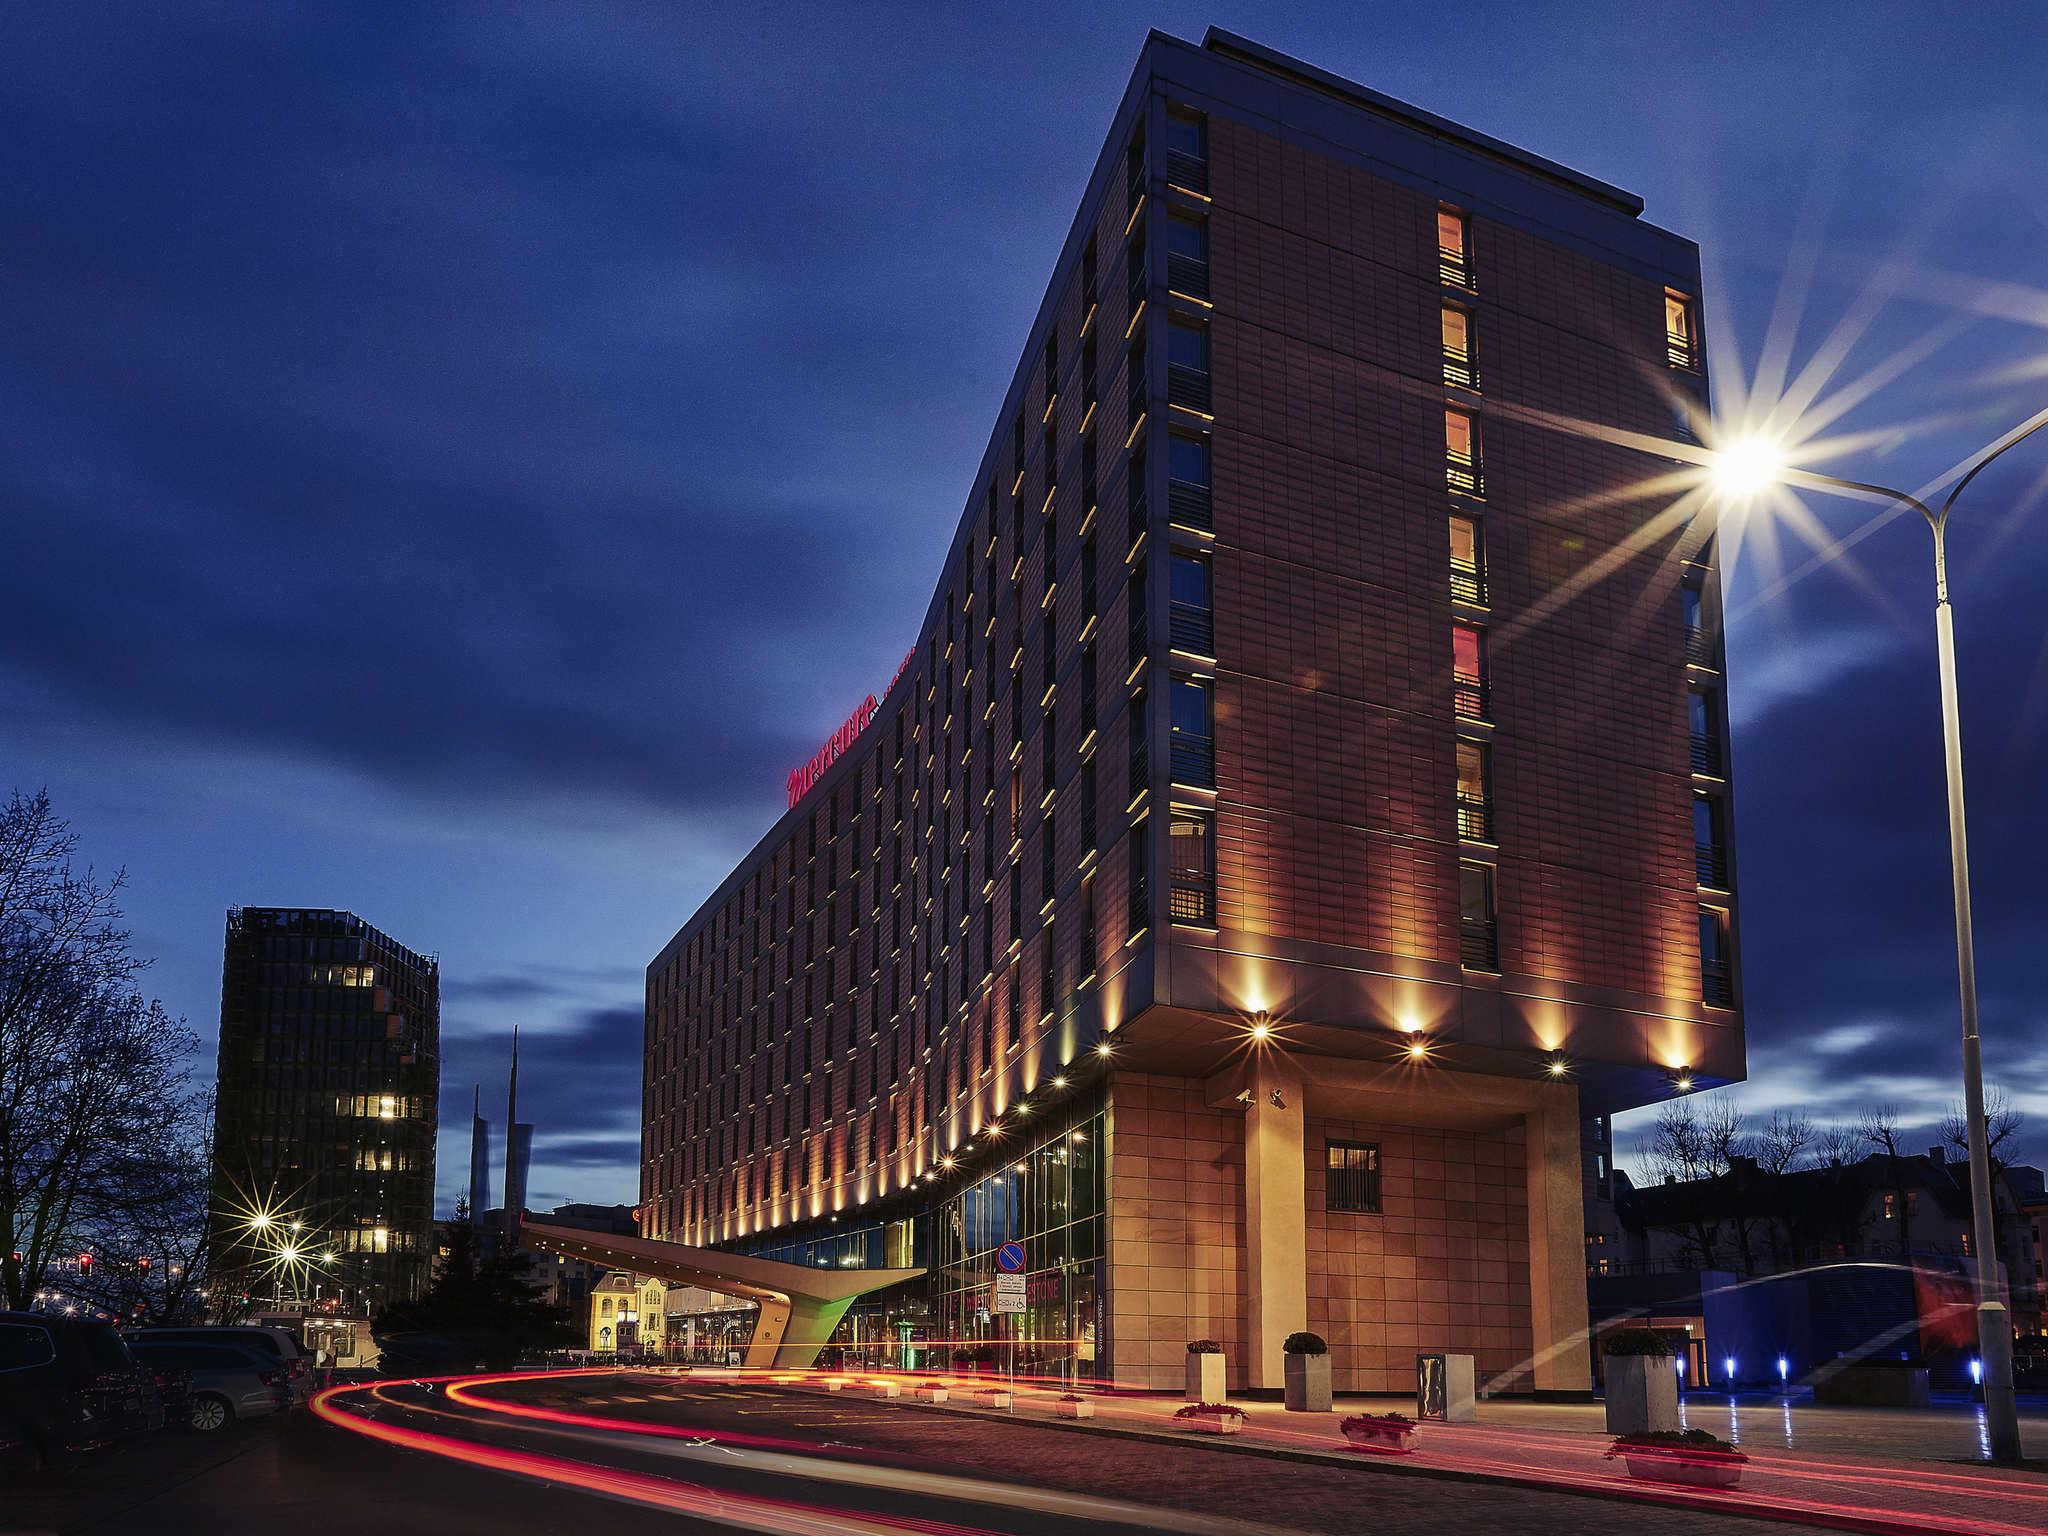 Otel – Hotel Mercure Poznan Centrum